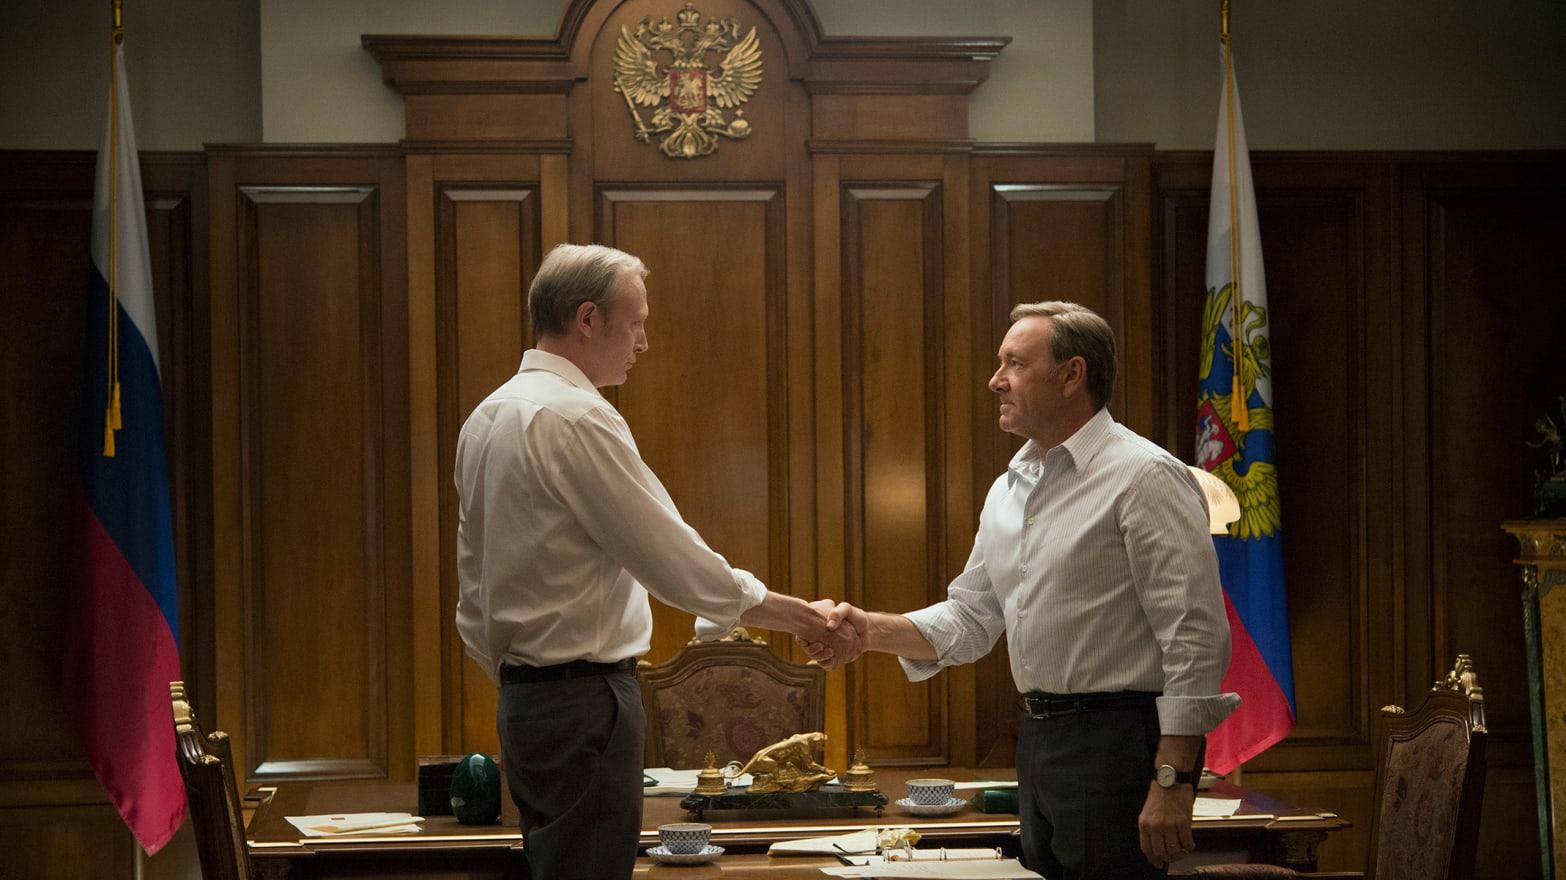 House Of Cards Vladimir Putin Villain Creator Beau Willimon On The Show S Russian Arc